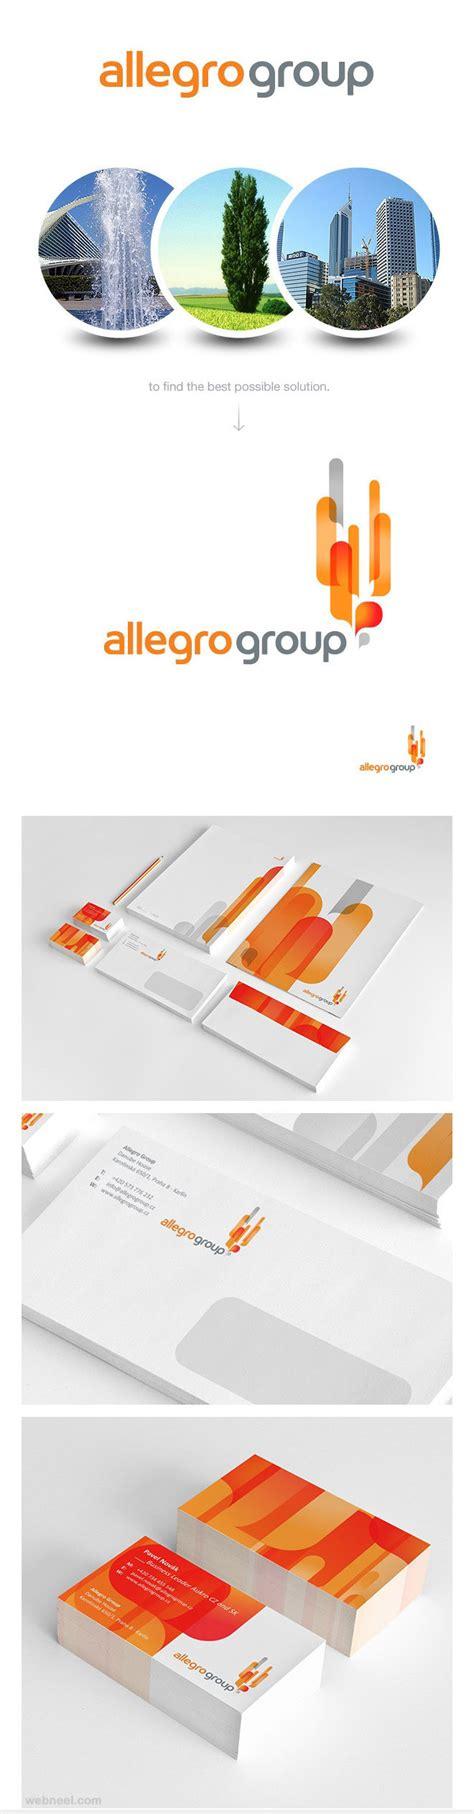 identity design exles 35 creative and beautiful branding identity design exles